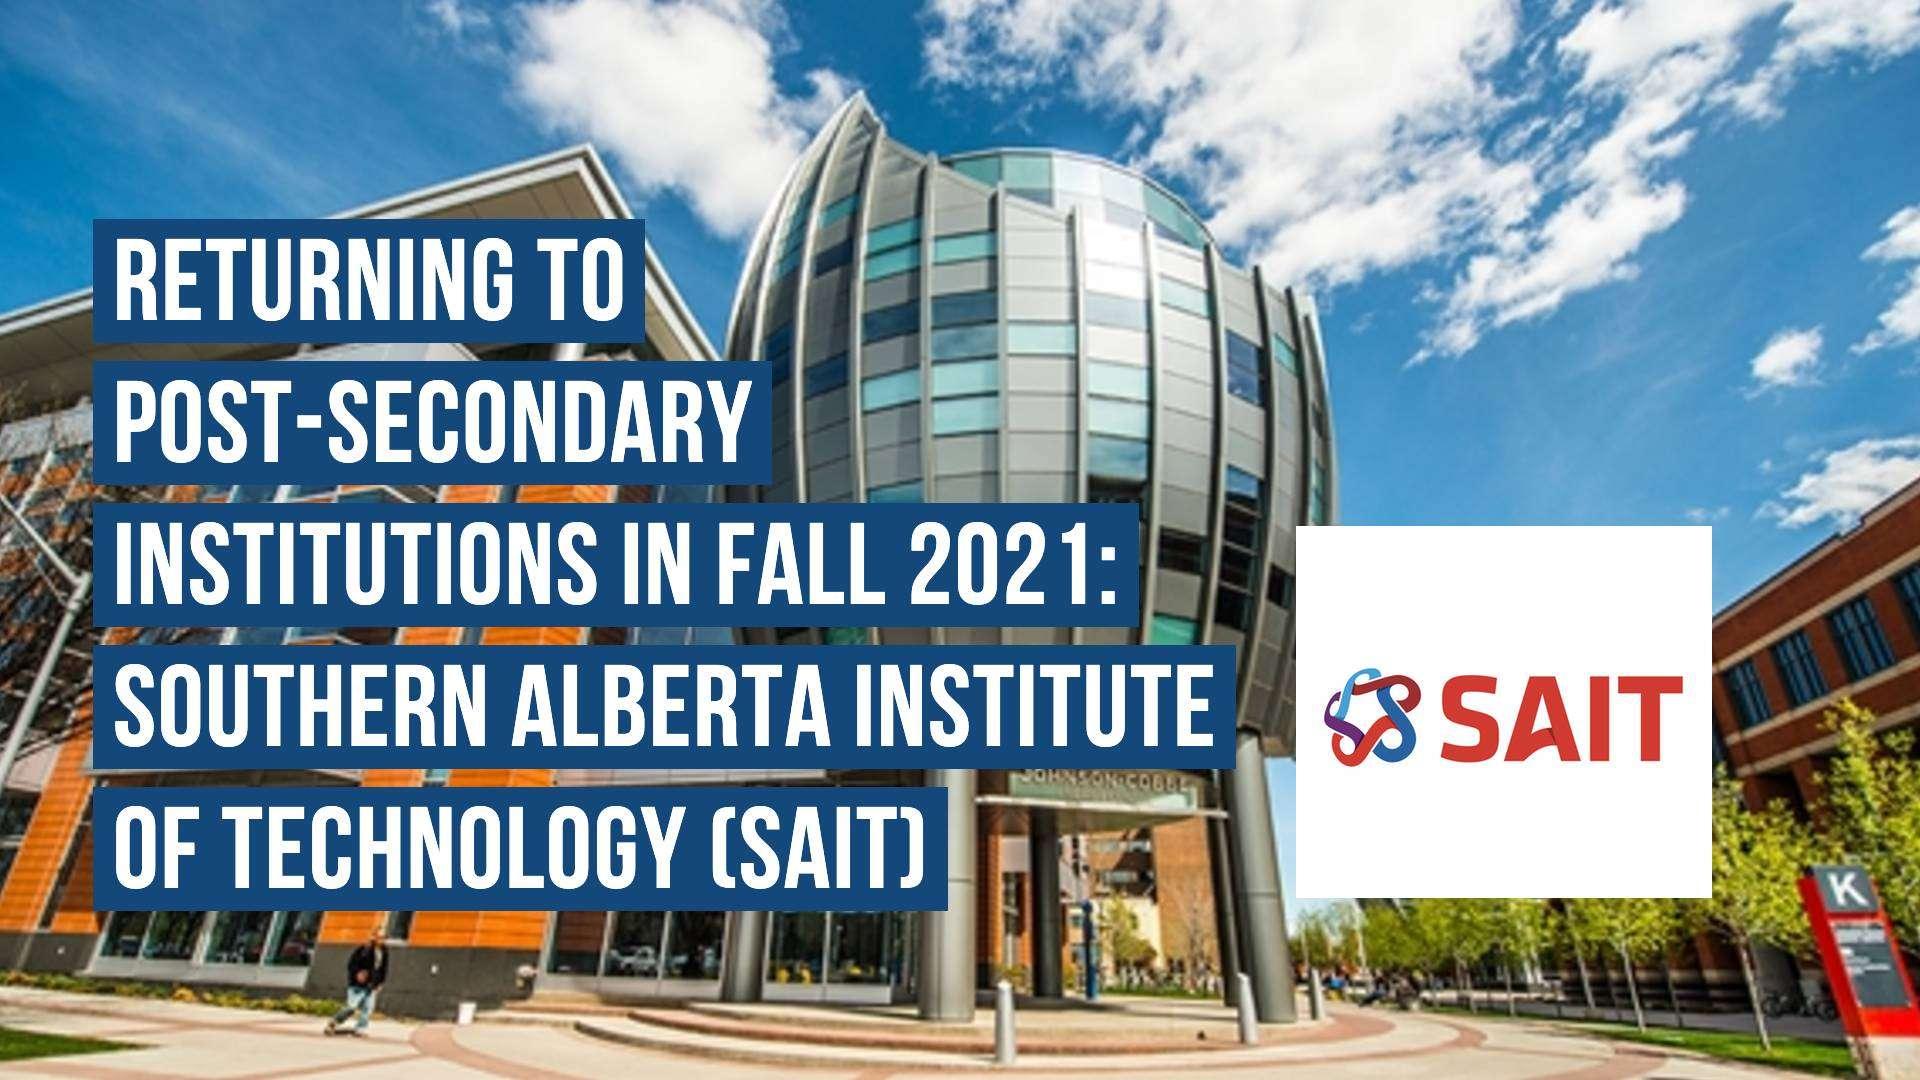 SAIT Return to Post-Secondary Canada